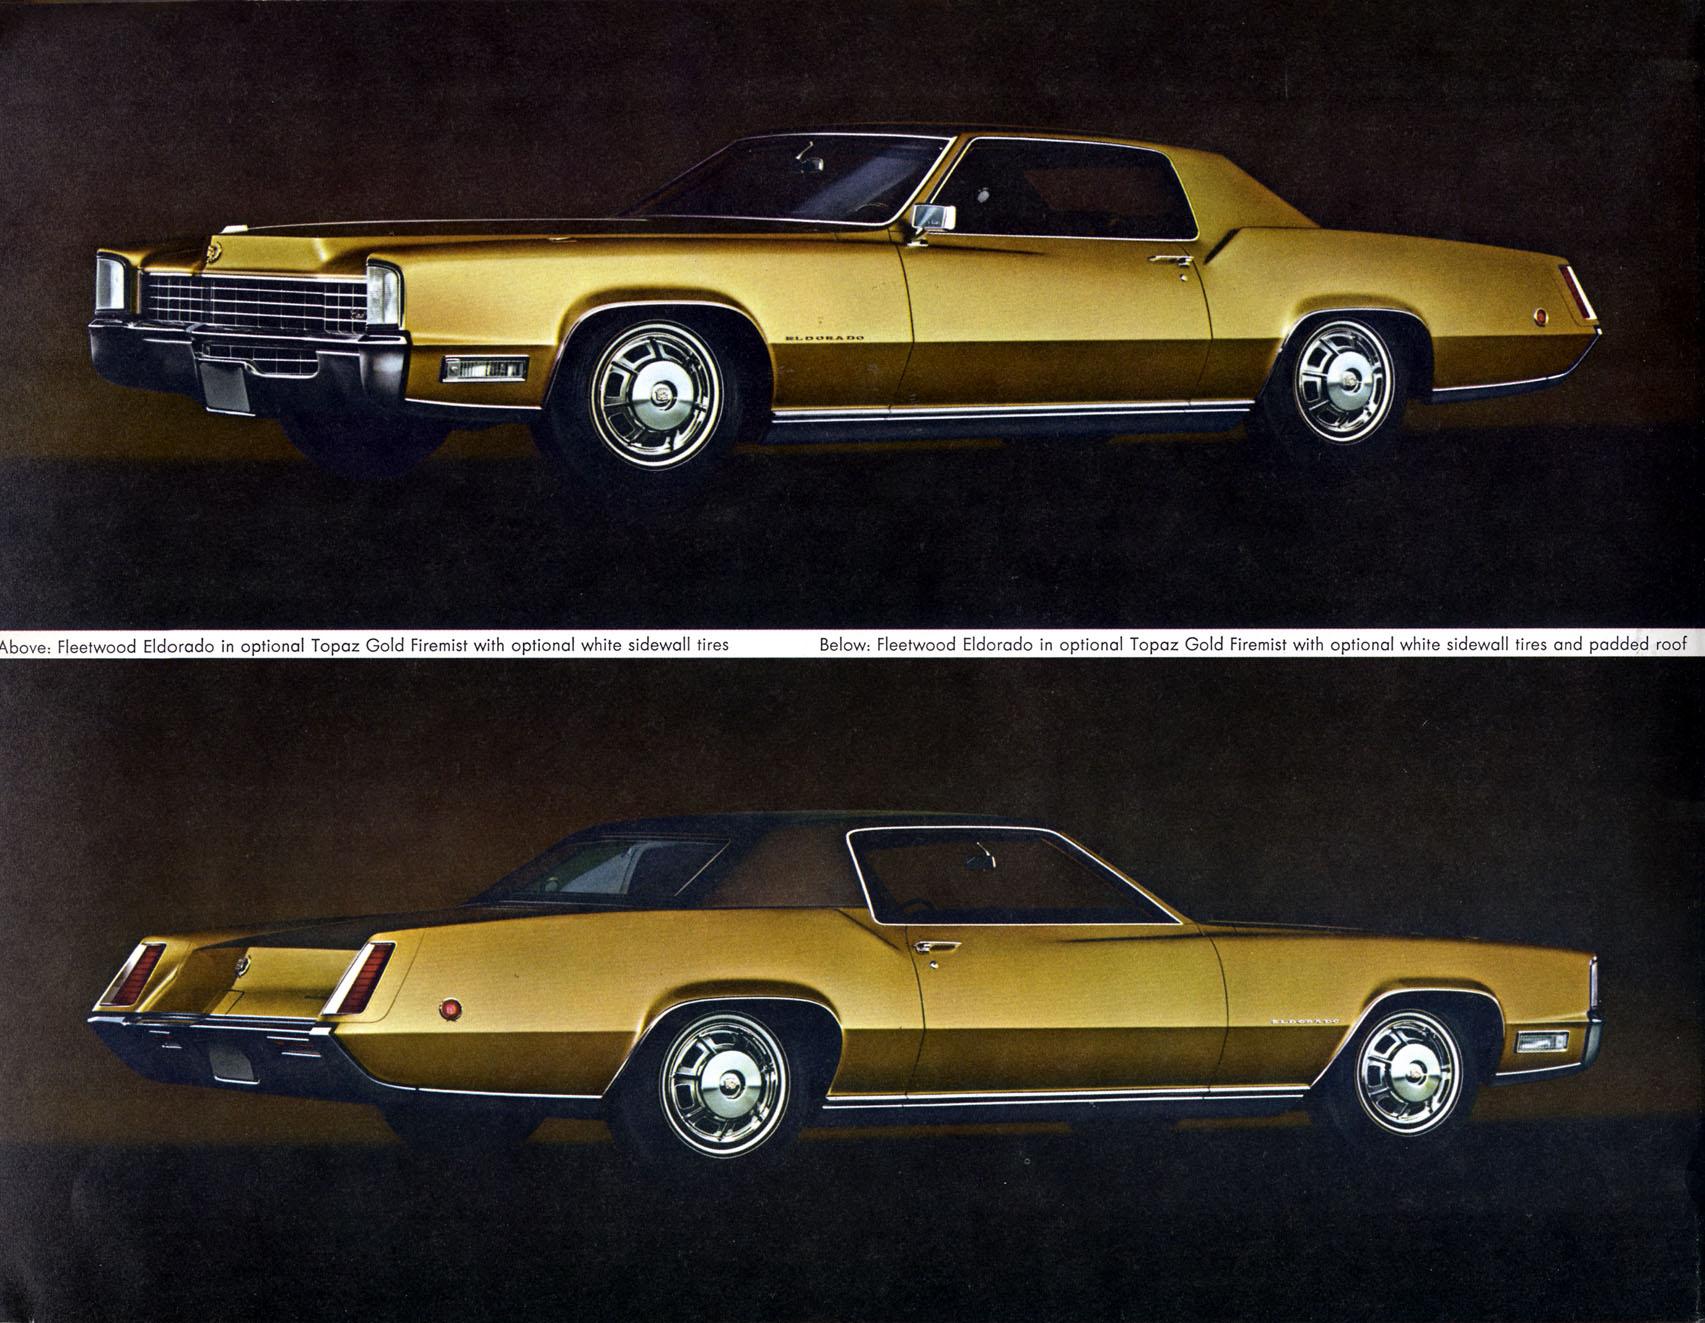 TunnelRam_Cadillac (16).jpg